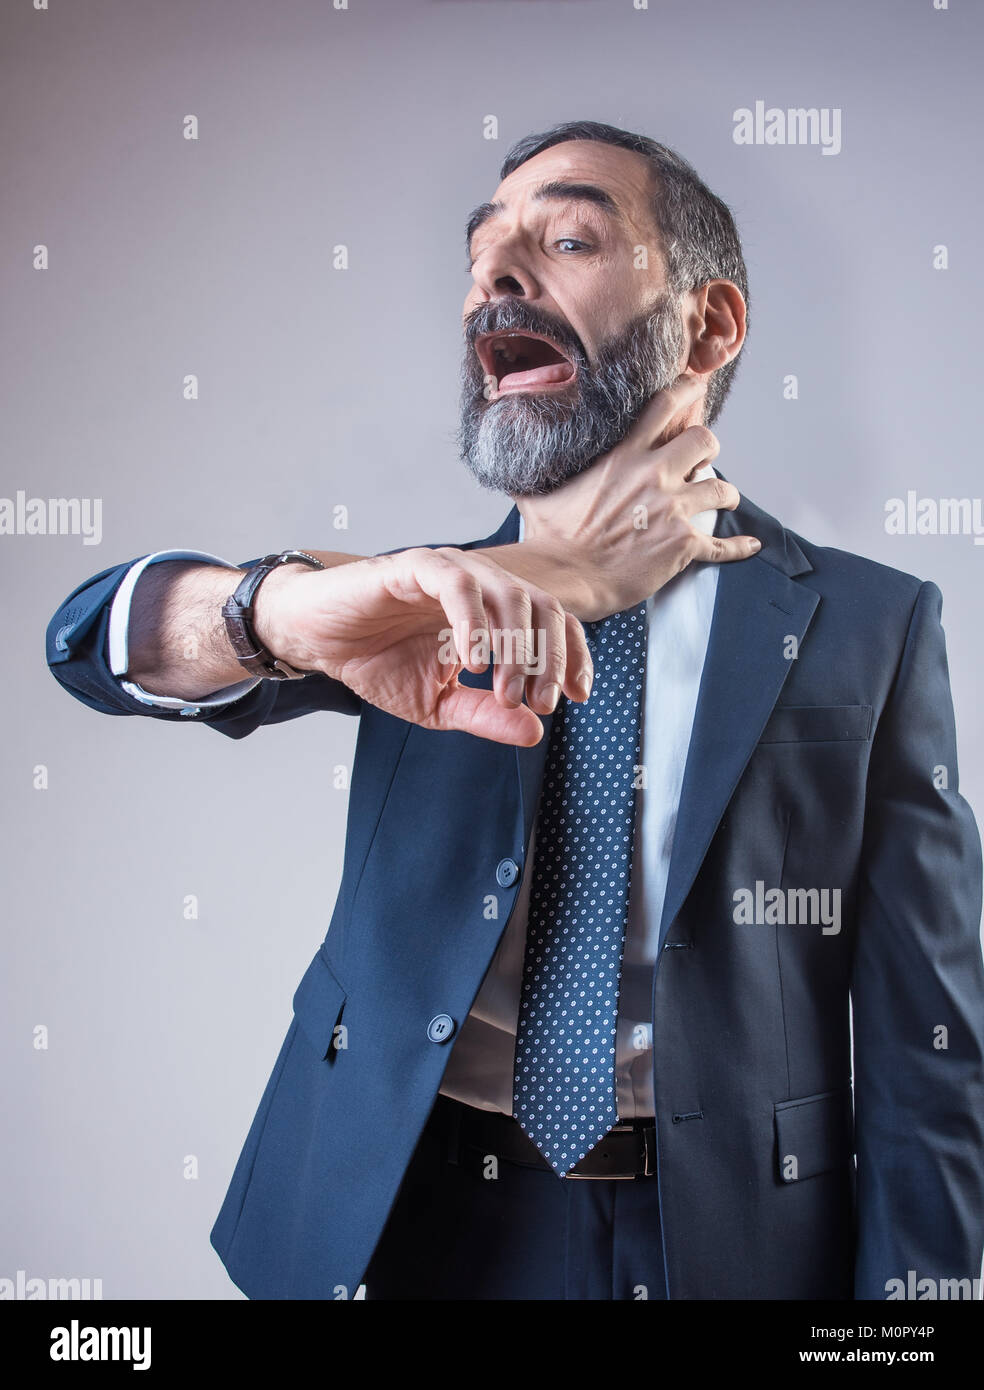 Wristwatch choking a senior business man - Stock Image